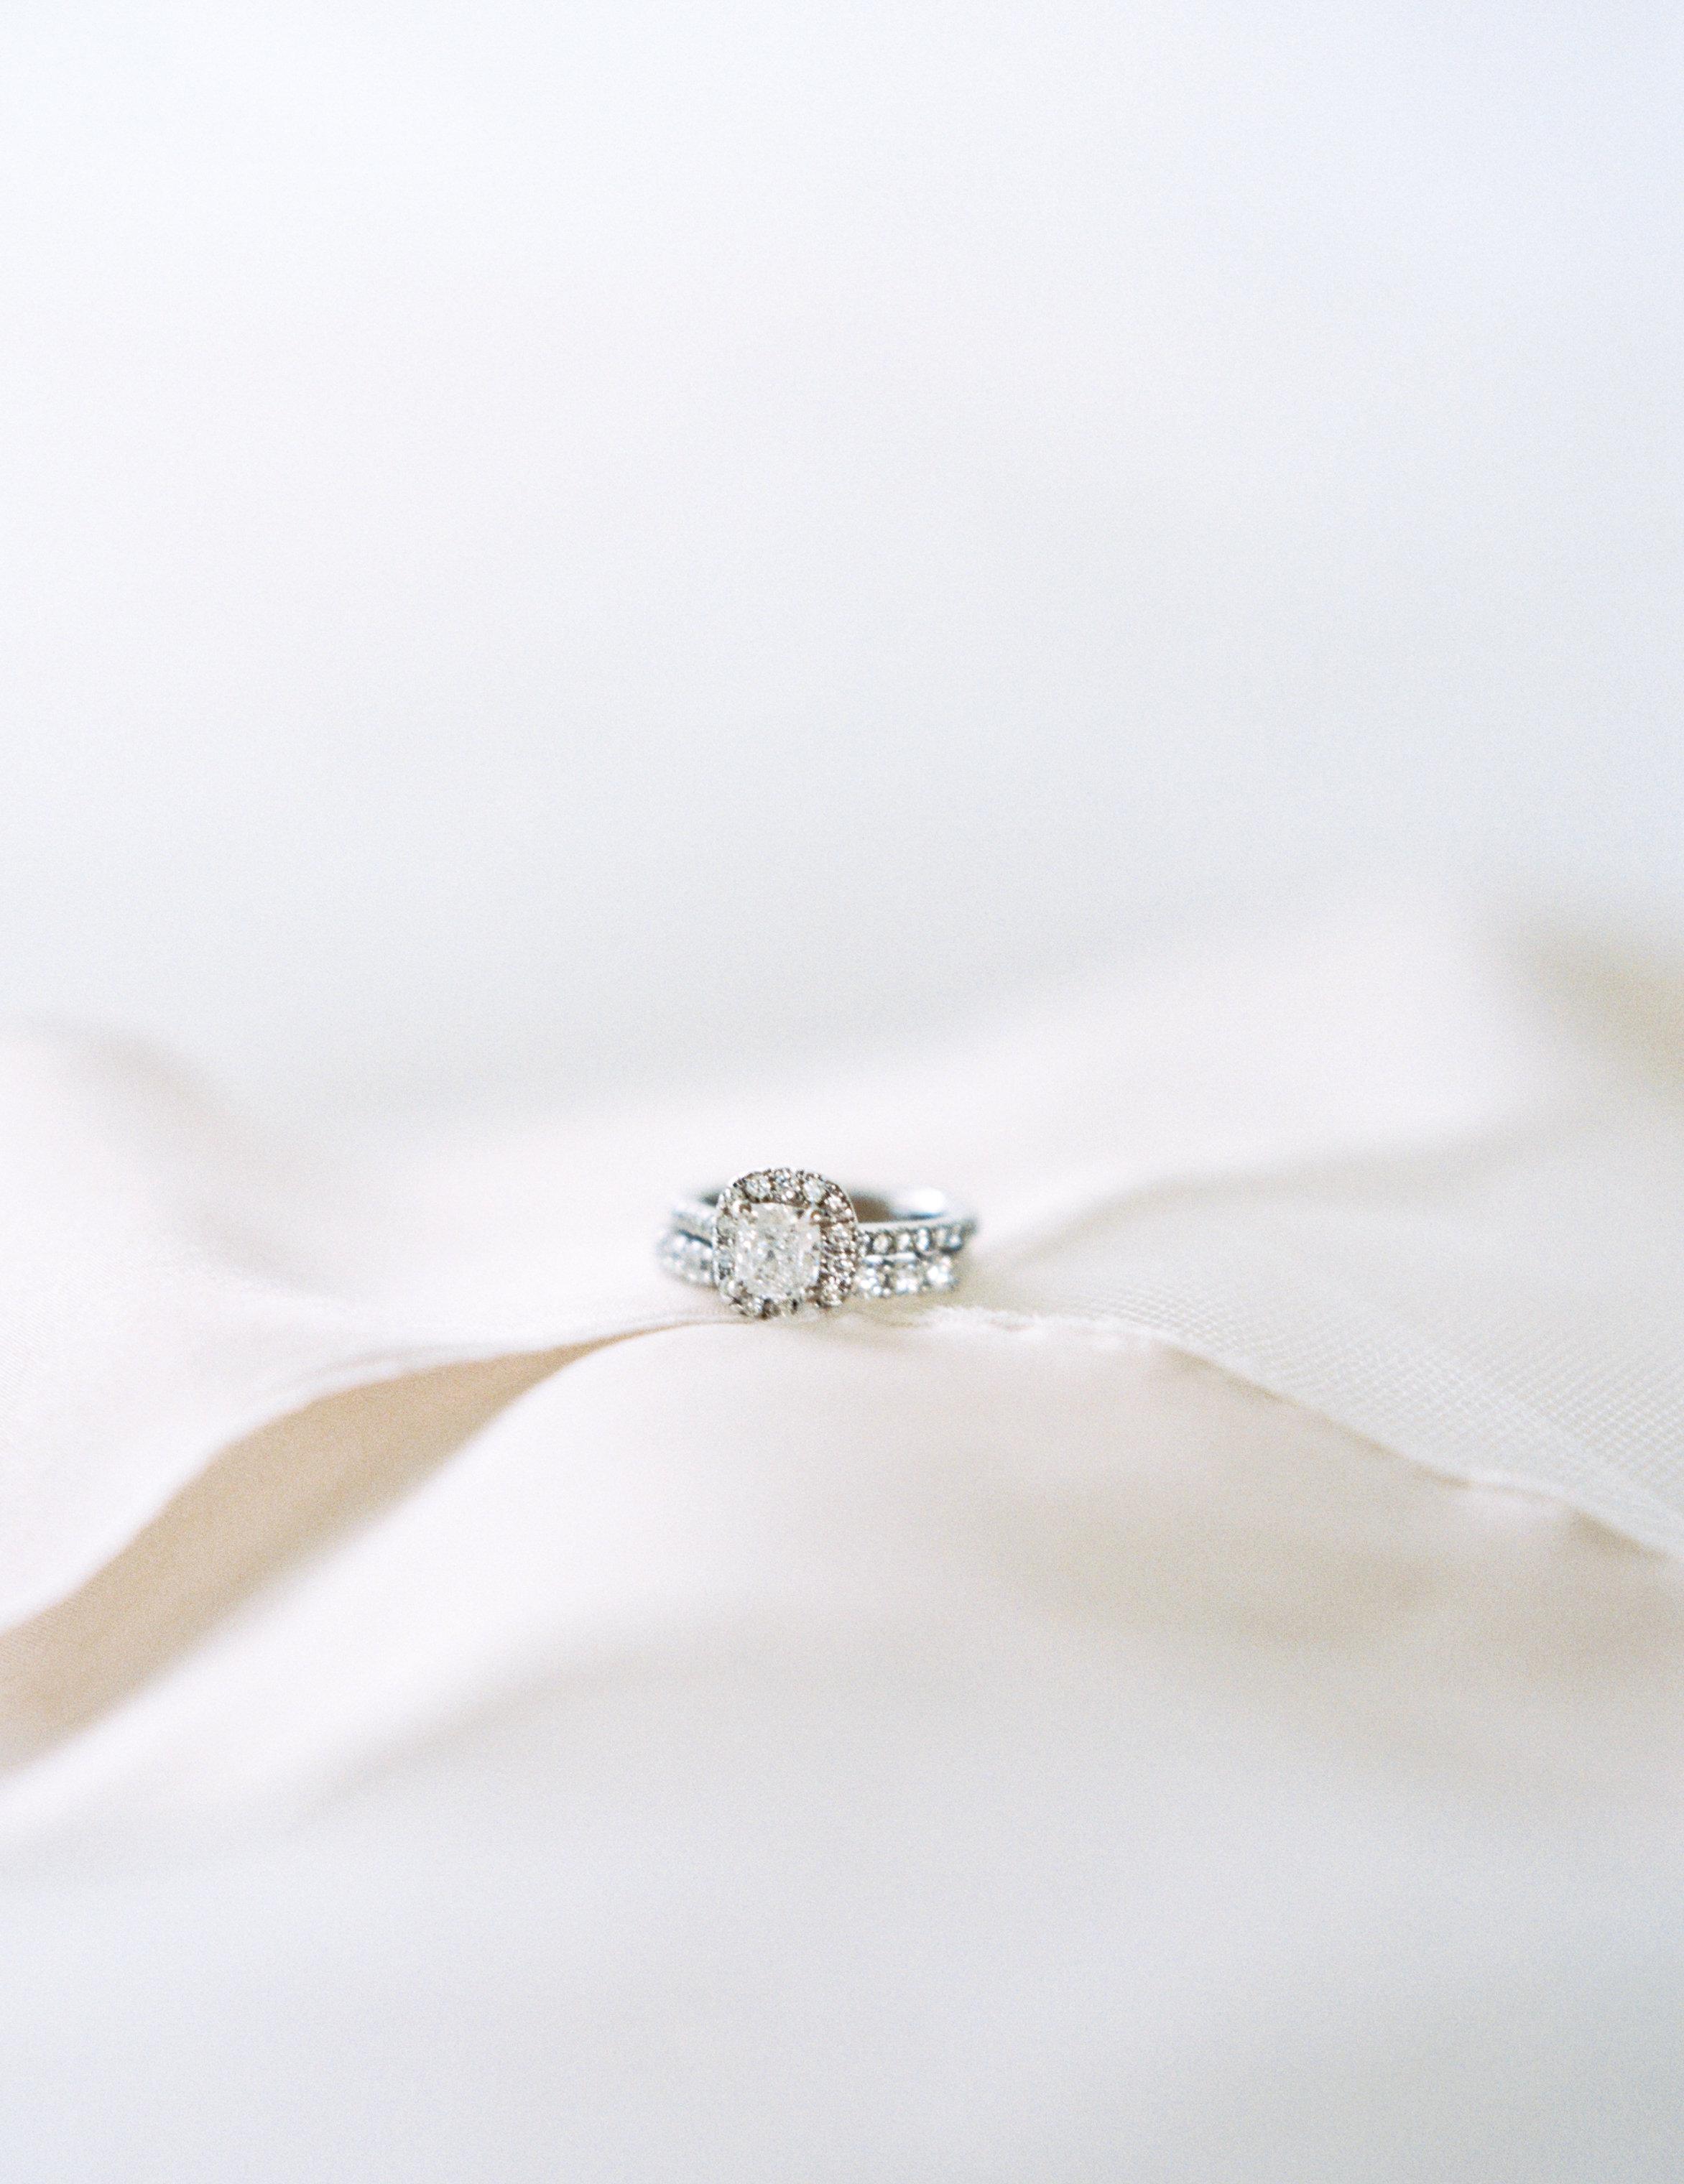 Wedding ring, engagement ring, destination wedding ring